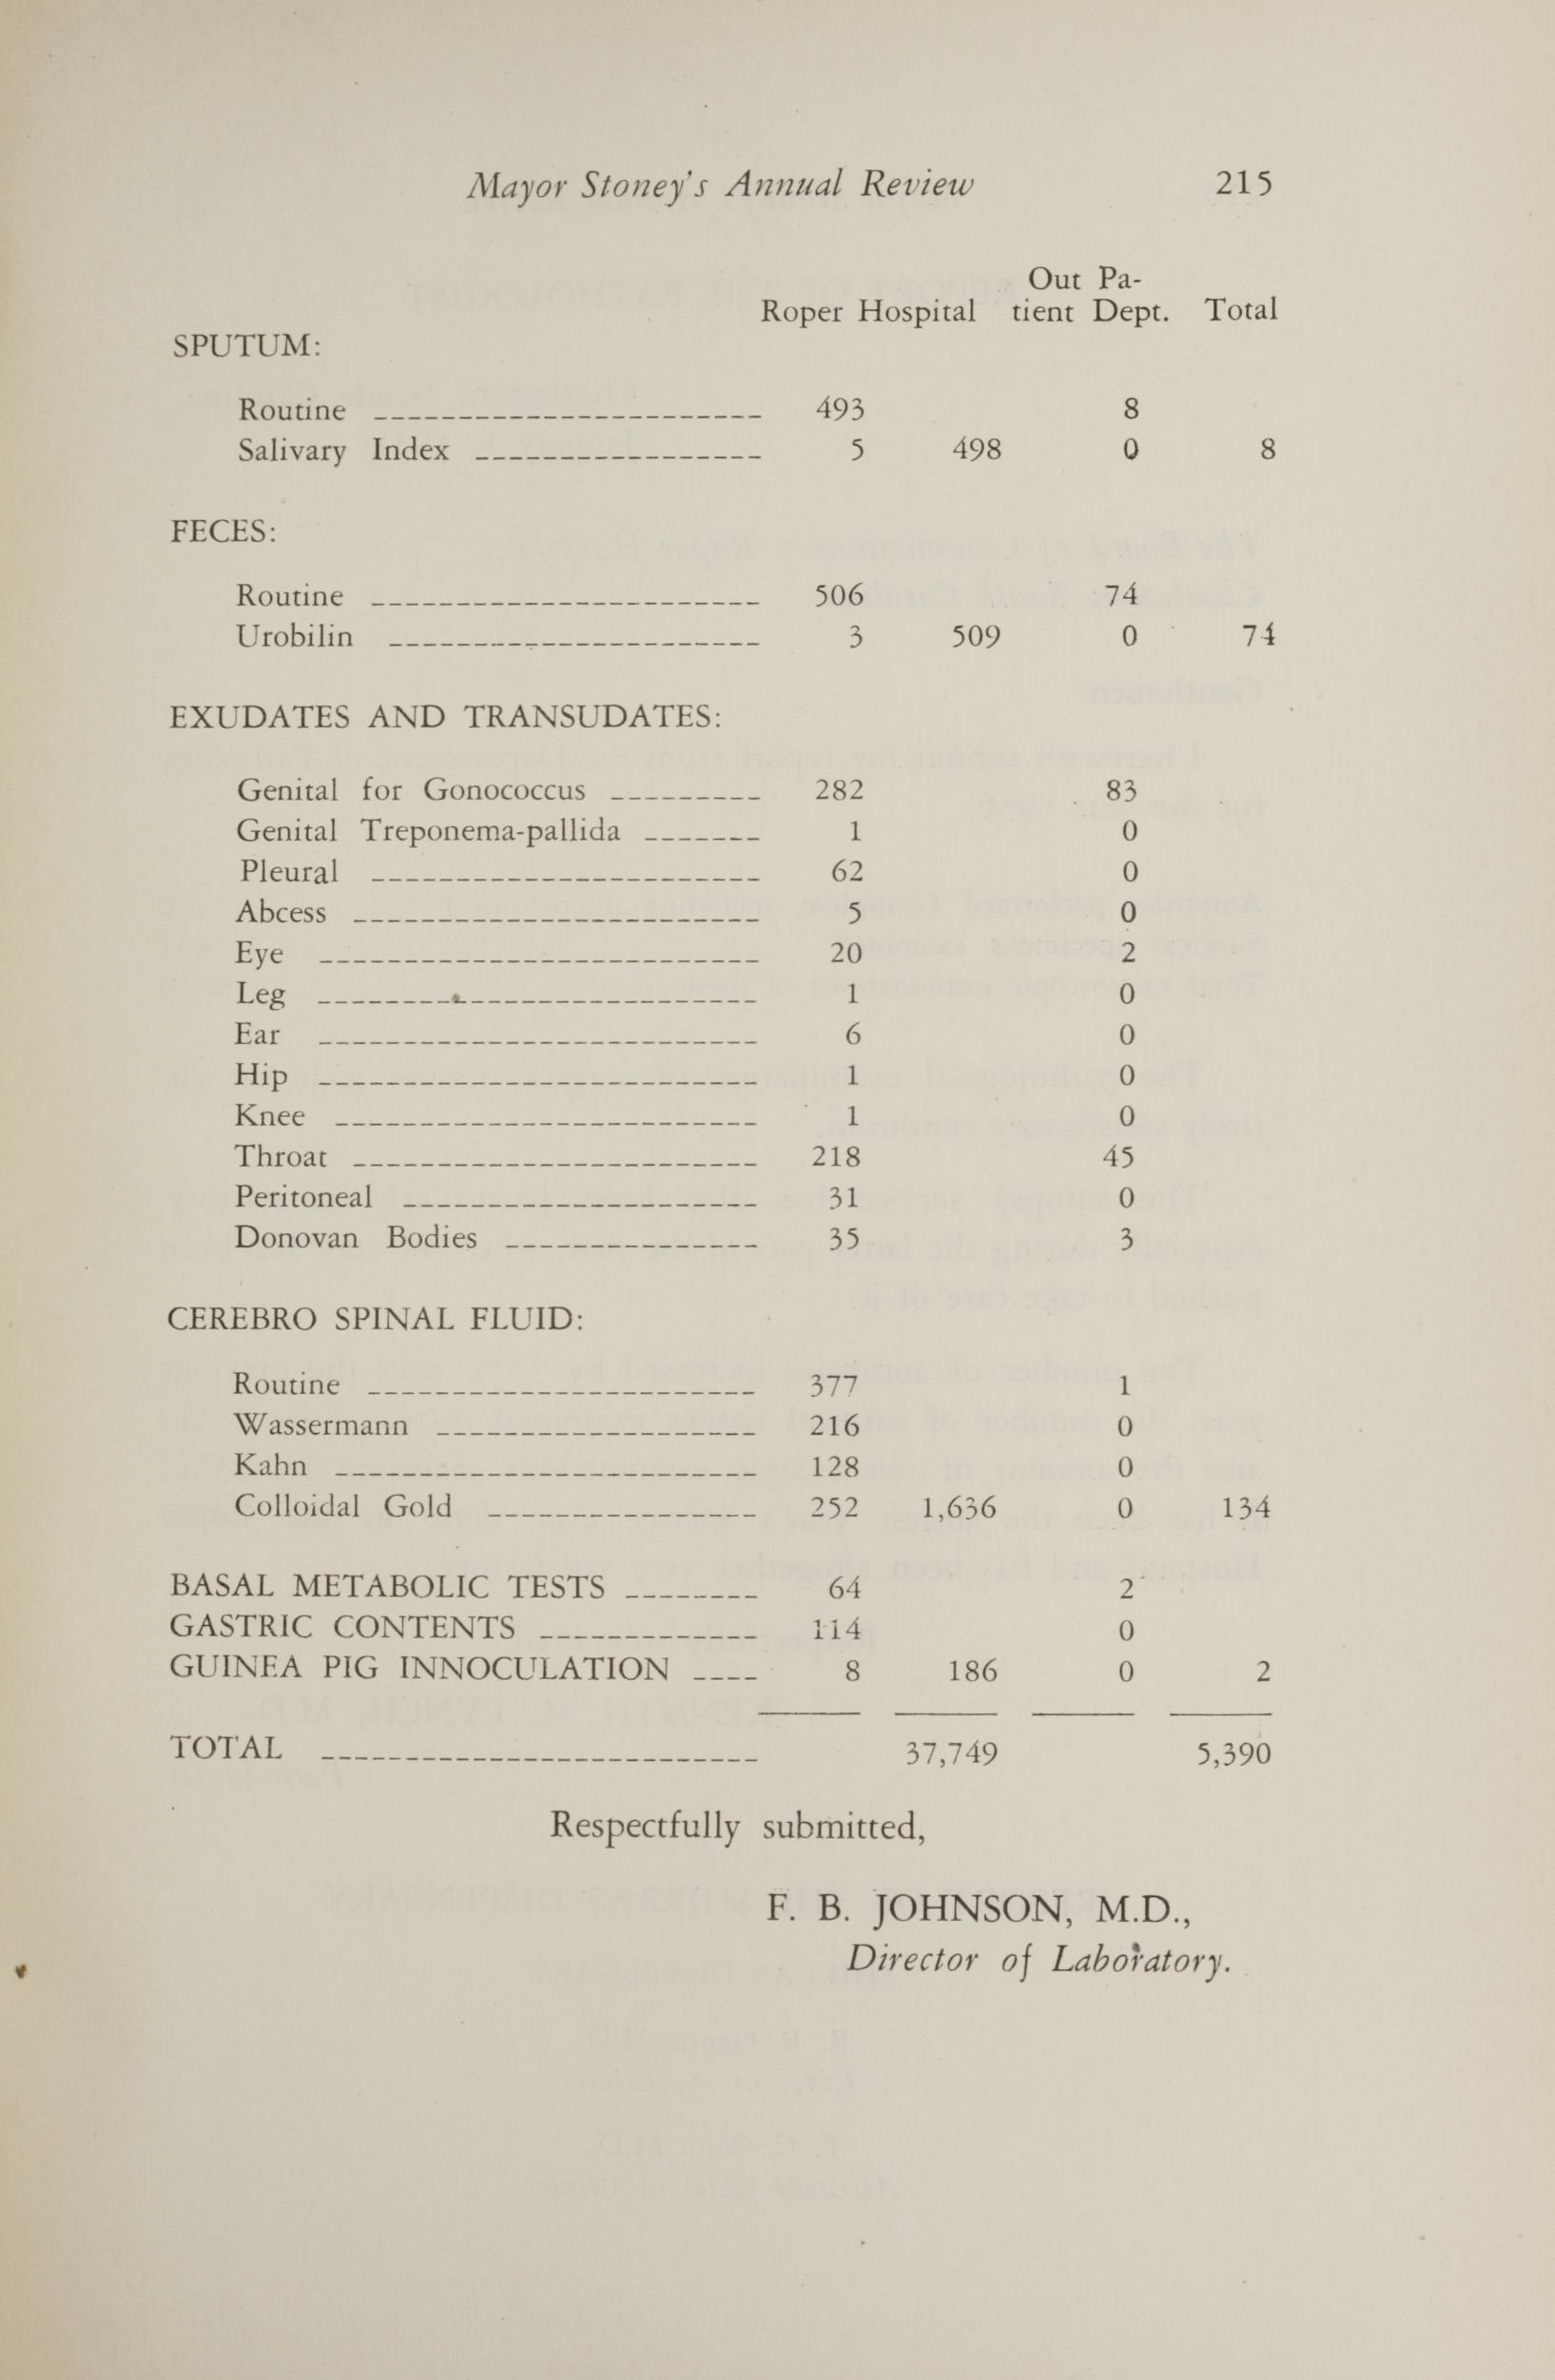 Charleston Yearbook, 1930, page 215